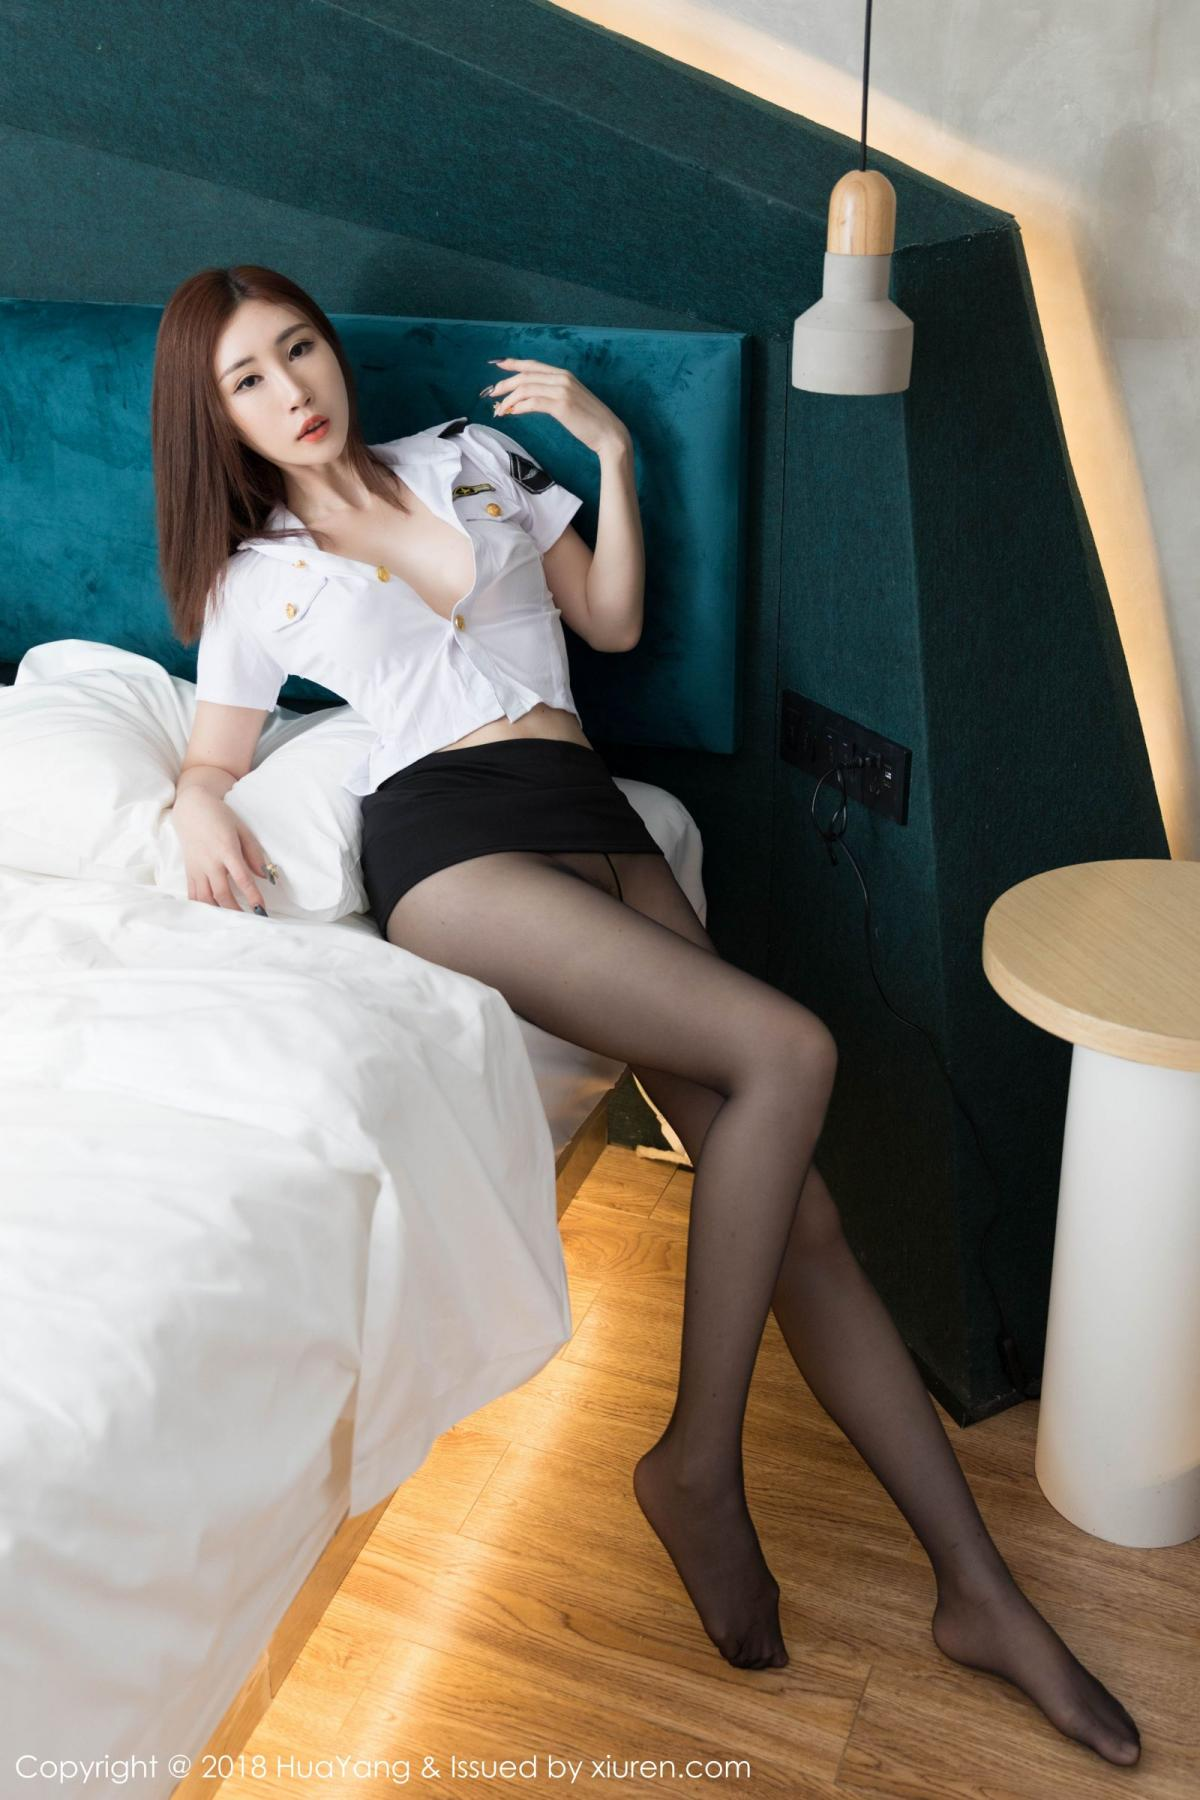 [Huayang] Vol.098 Sun Meng Yao 23P, Black Silk, HuaYang, Sun Meng Yao, Uniform